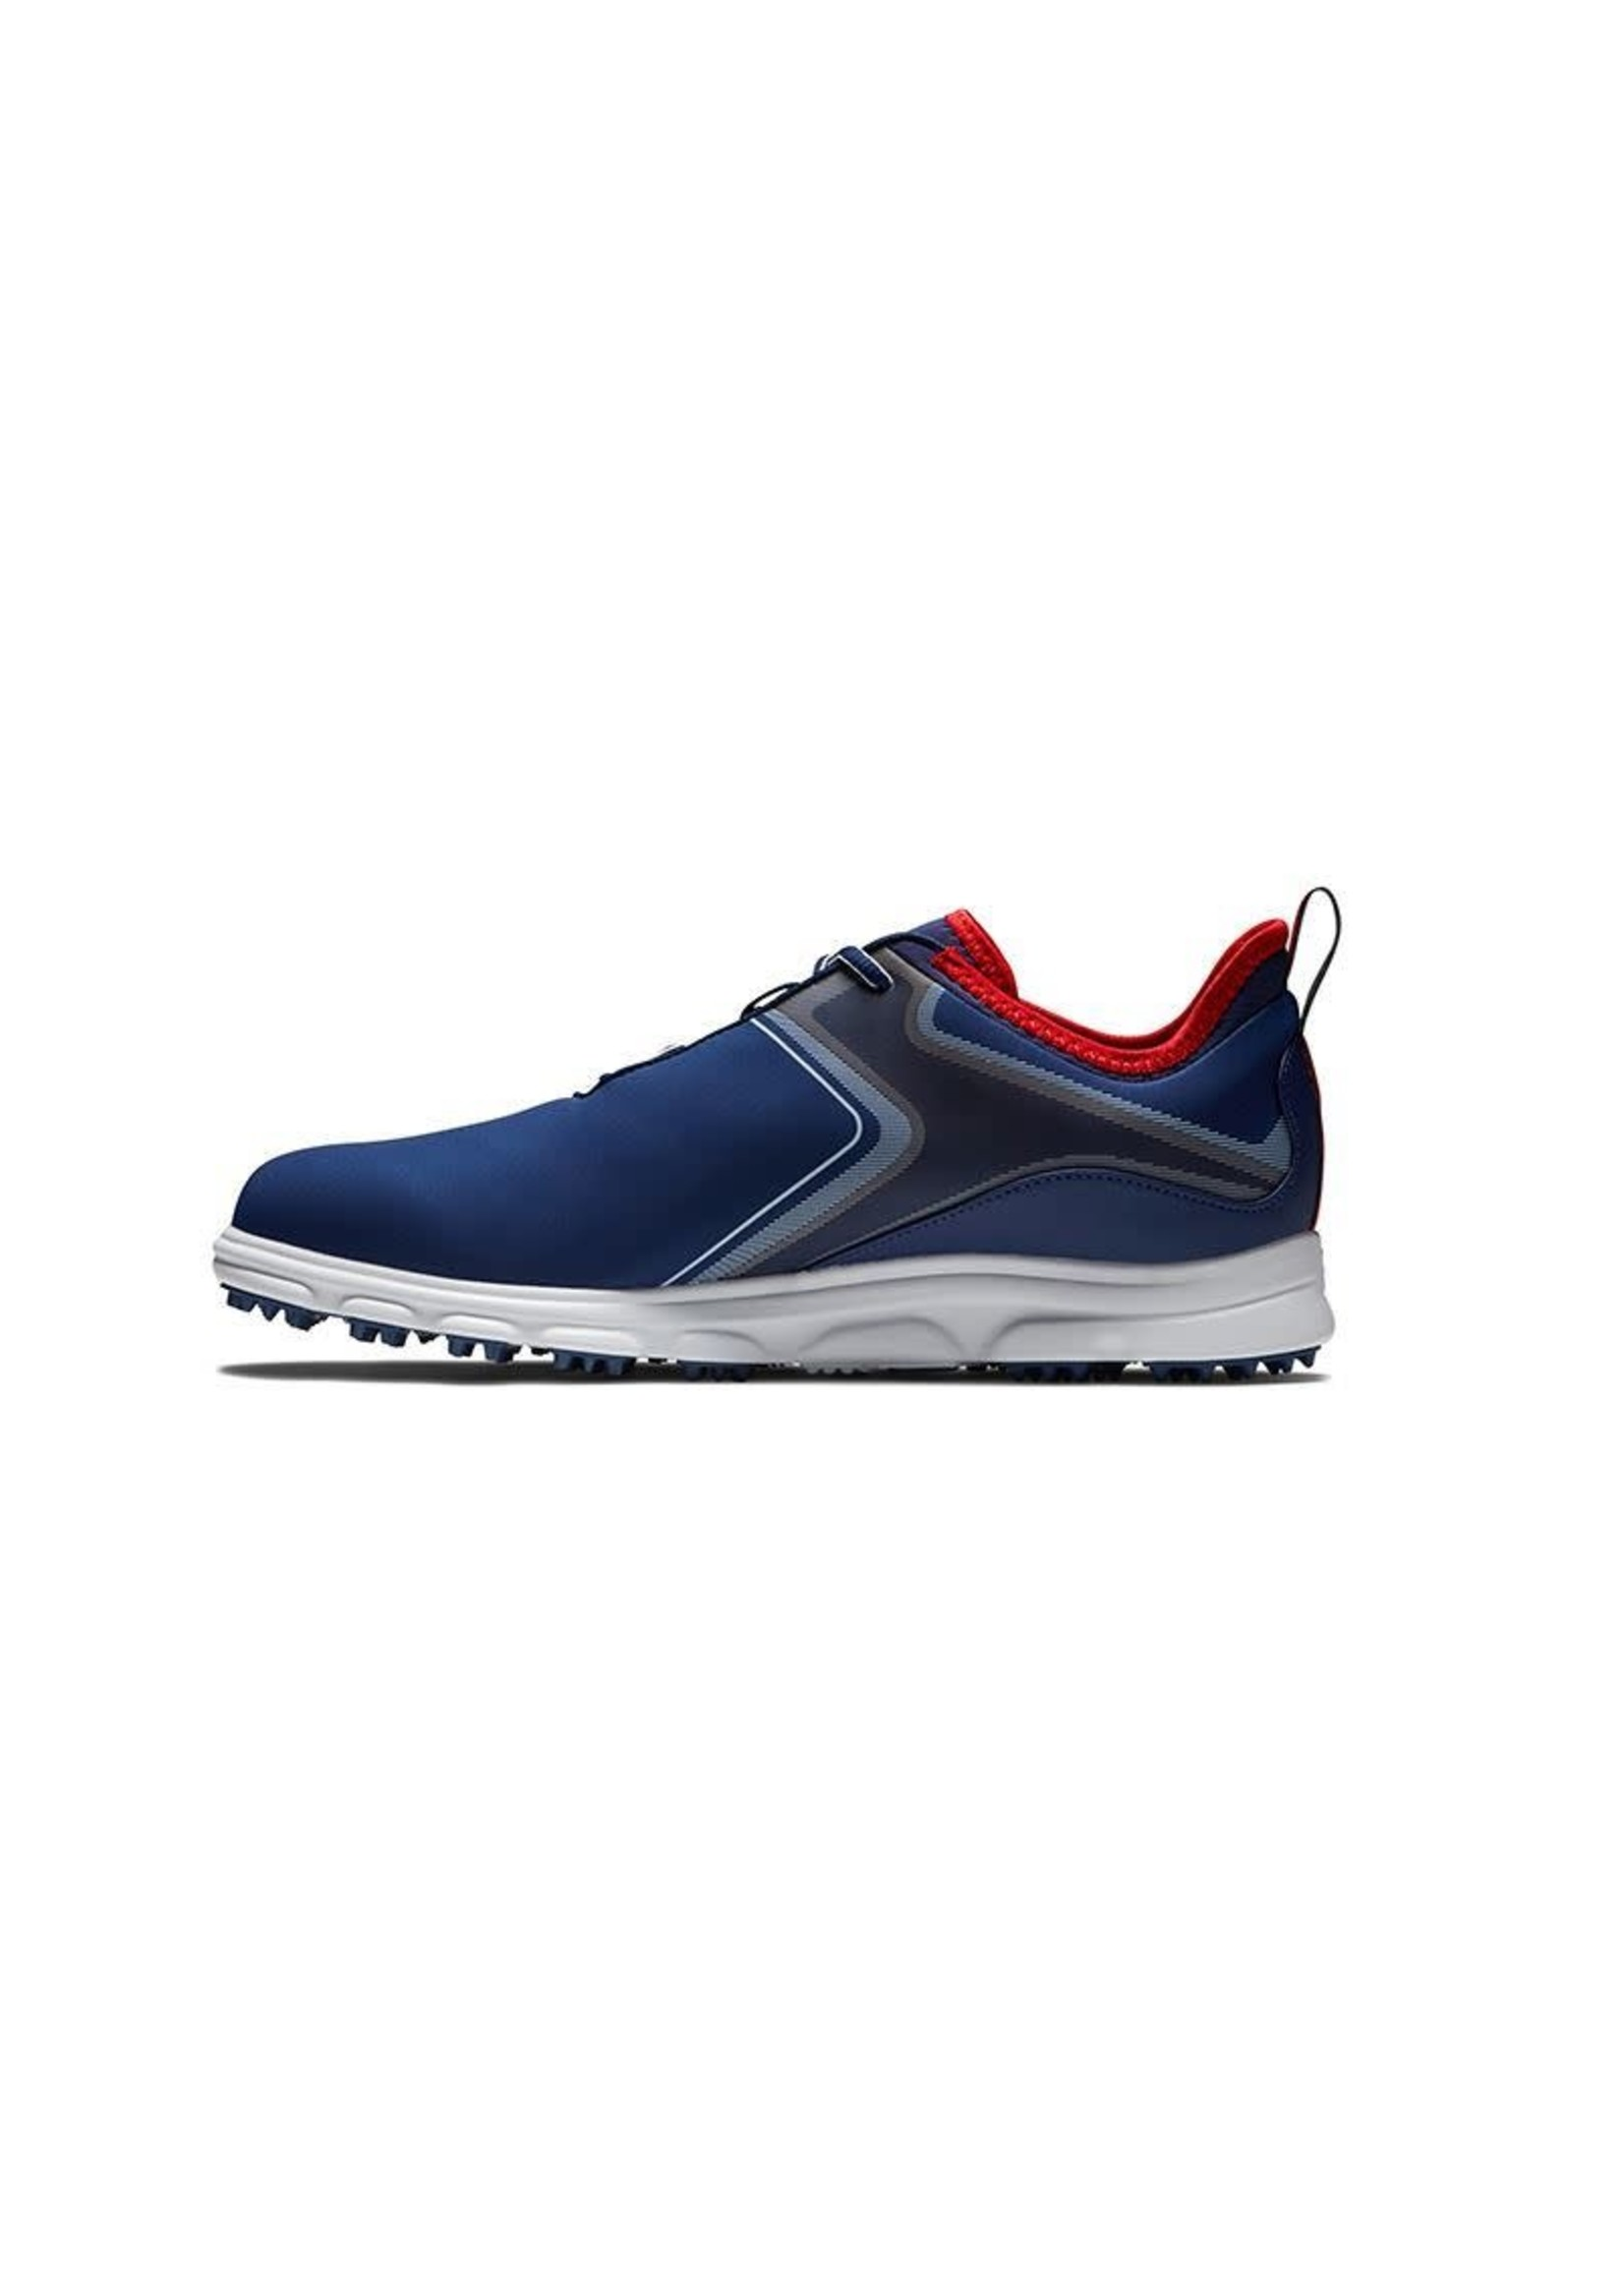 Footjoy FootJoy Men's Superlites XP Golf Shoe, Navy/White/Red, (2021)